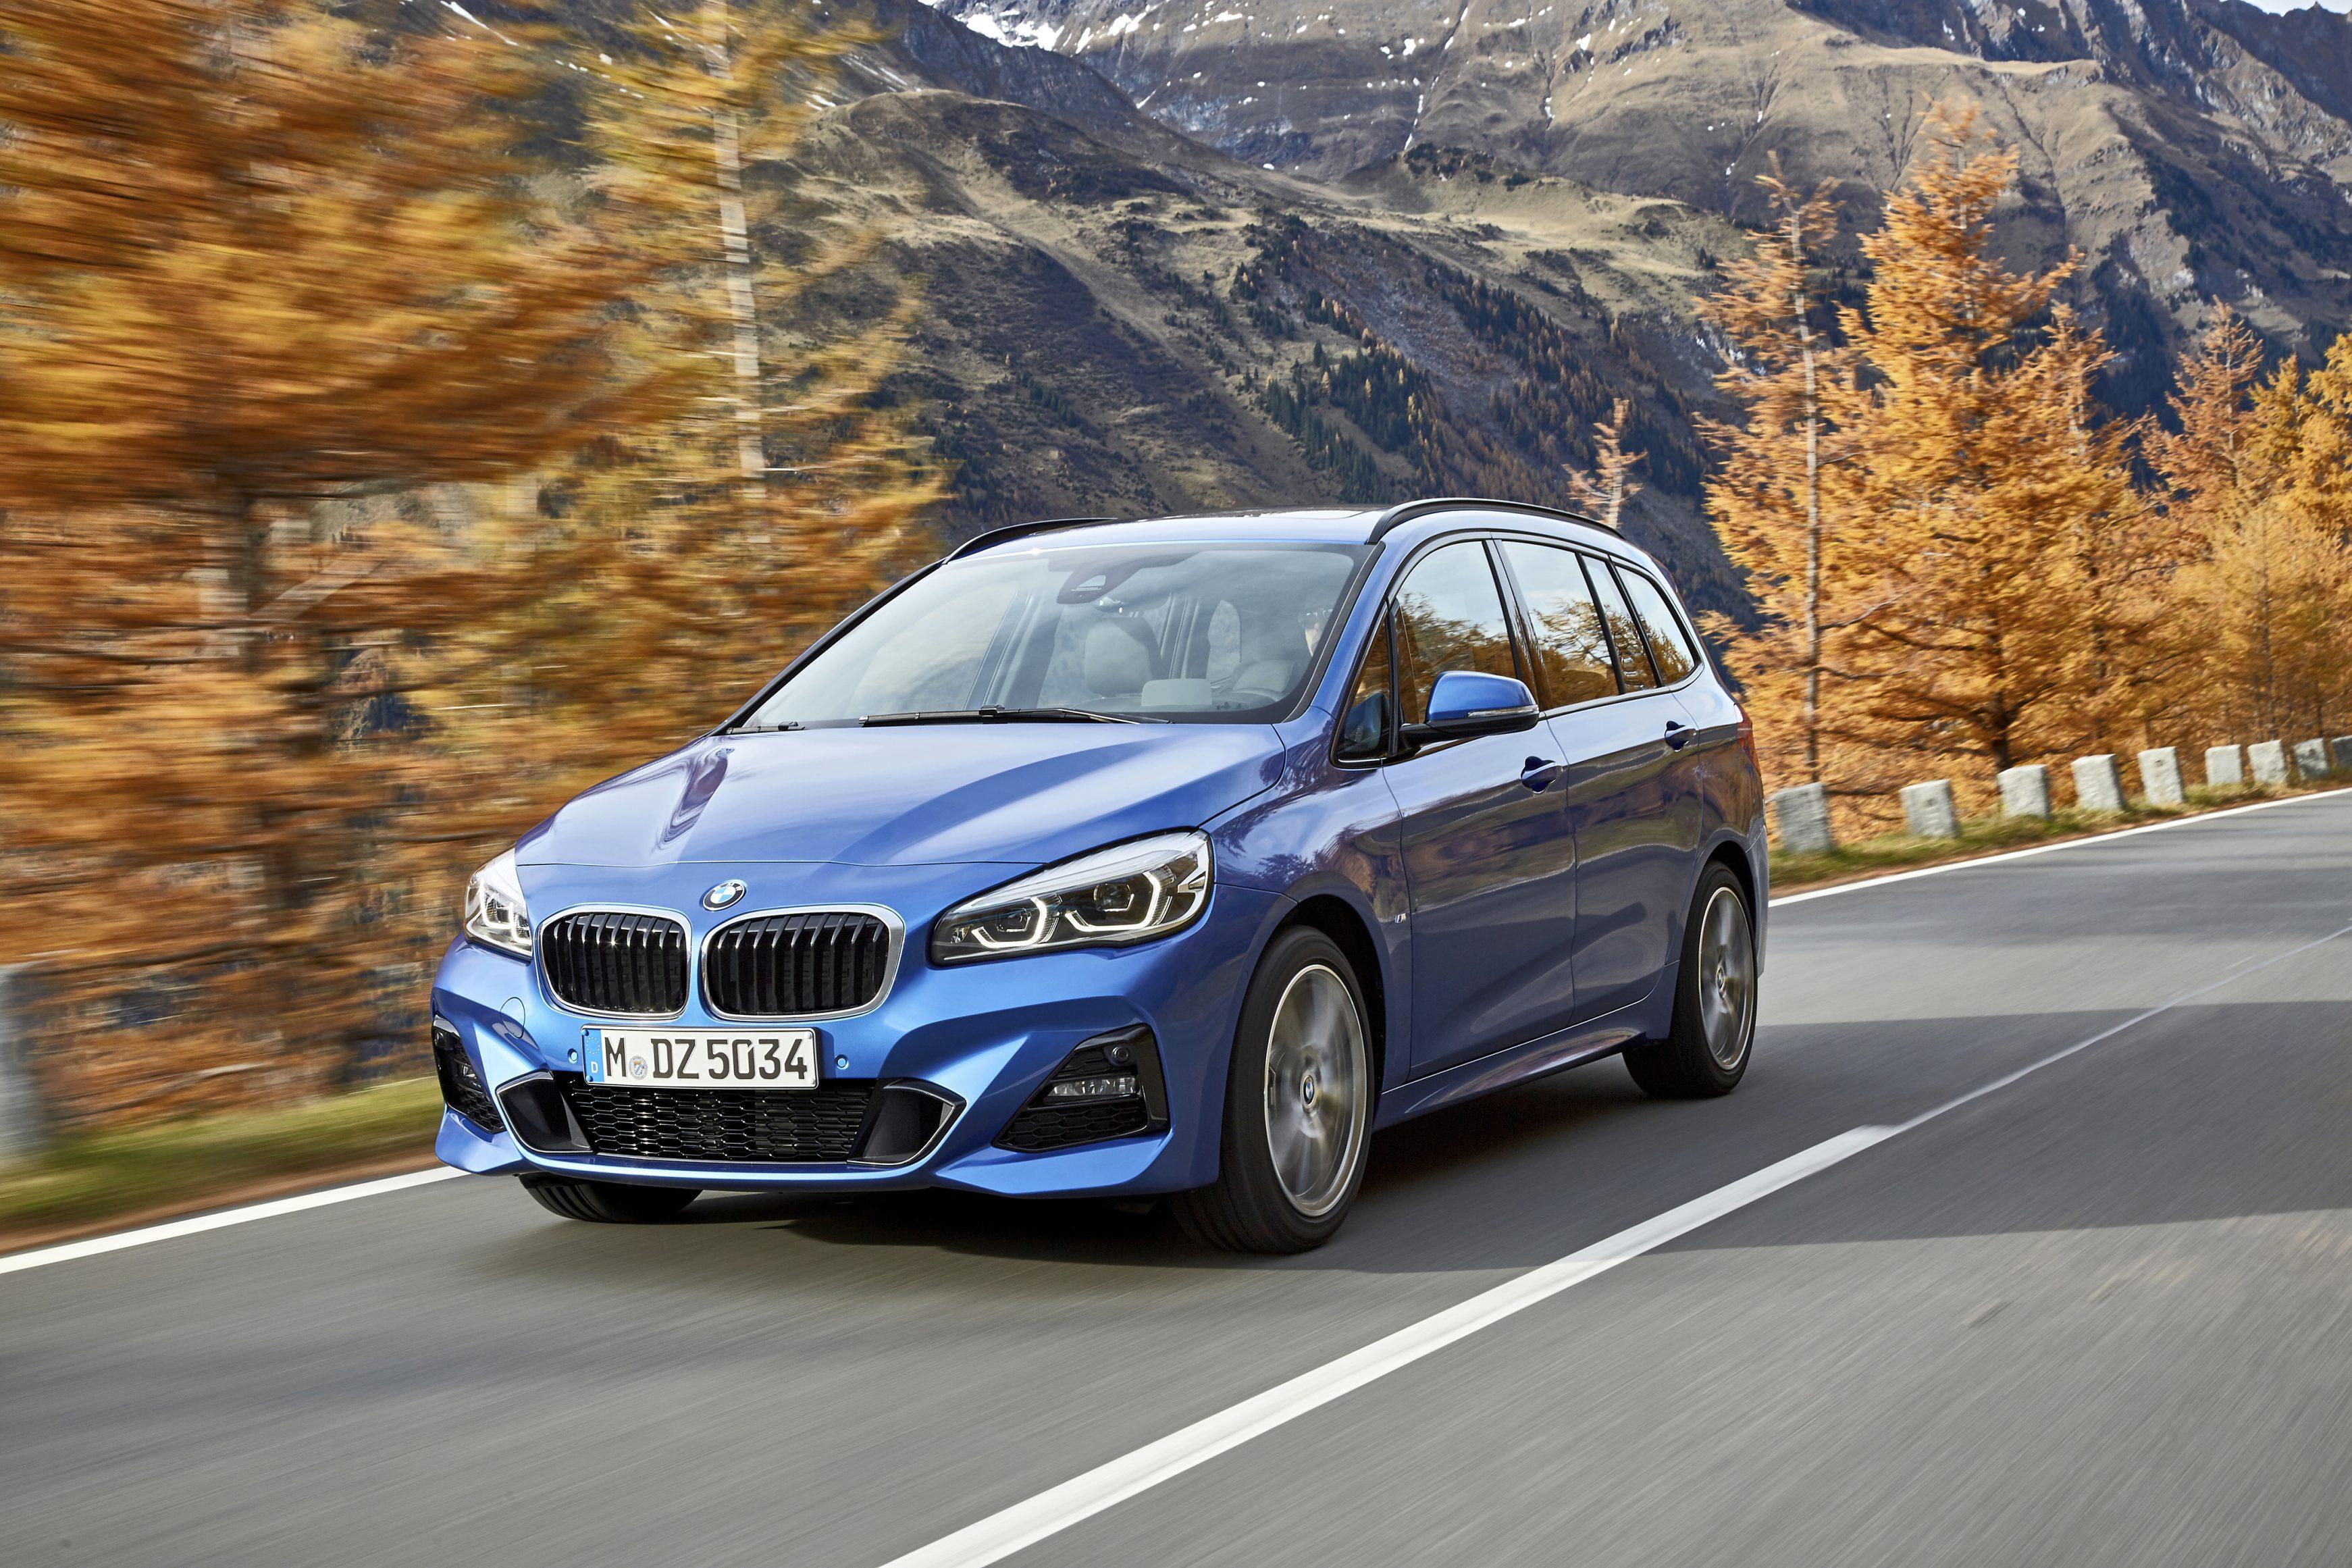 Best people carriers in 2021 - BMW 2 Series Gran Tourer